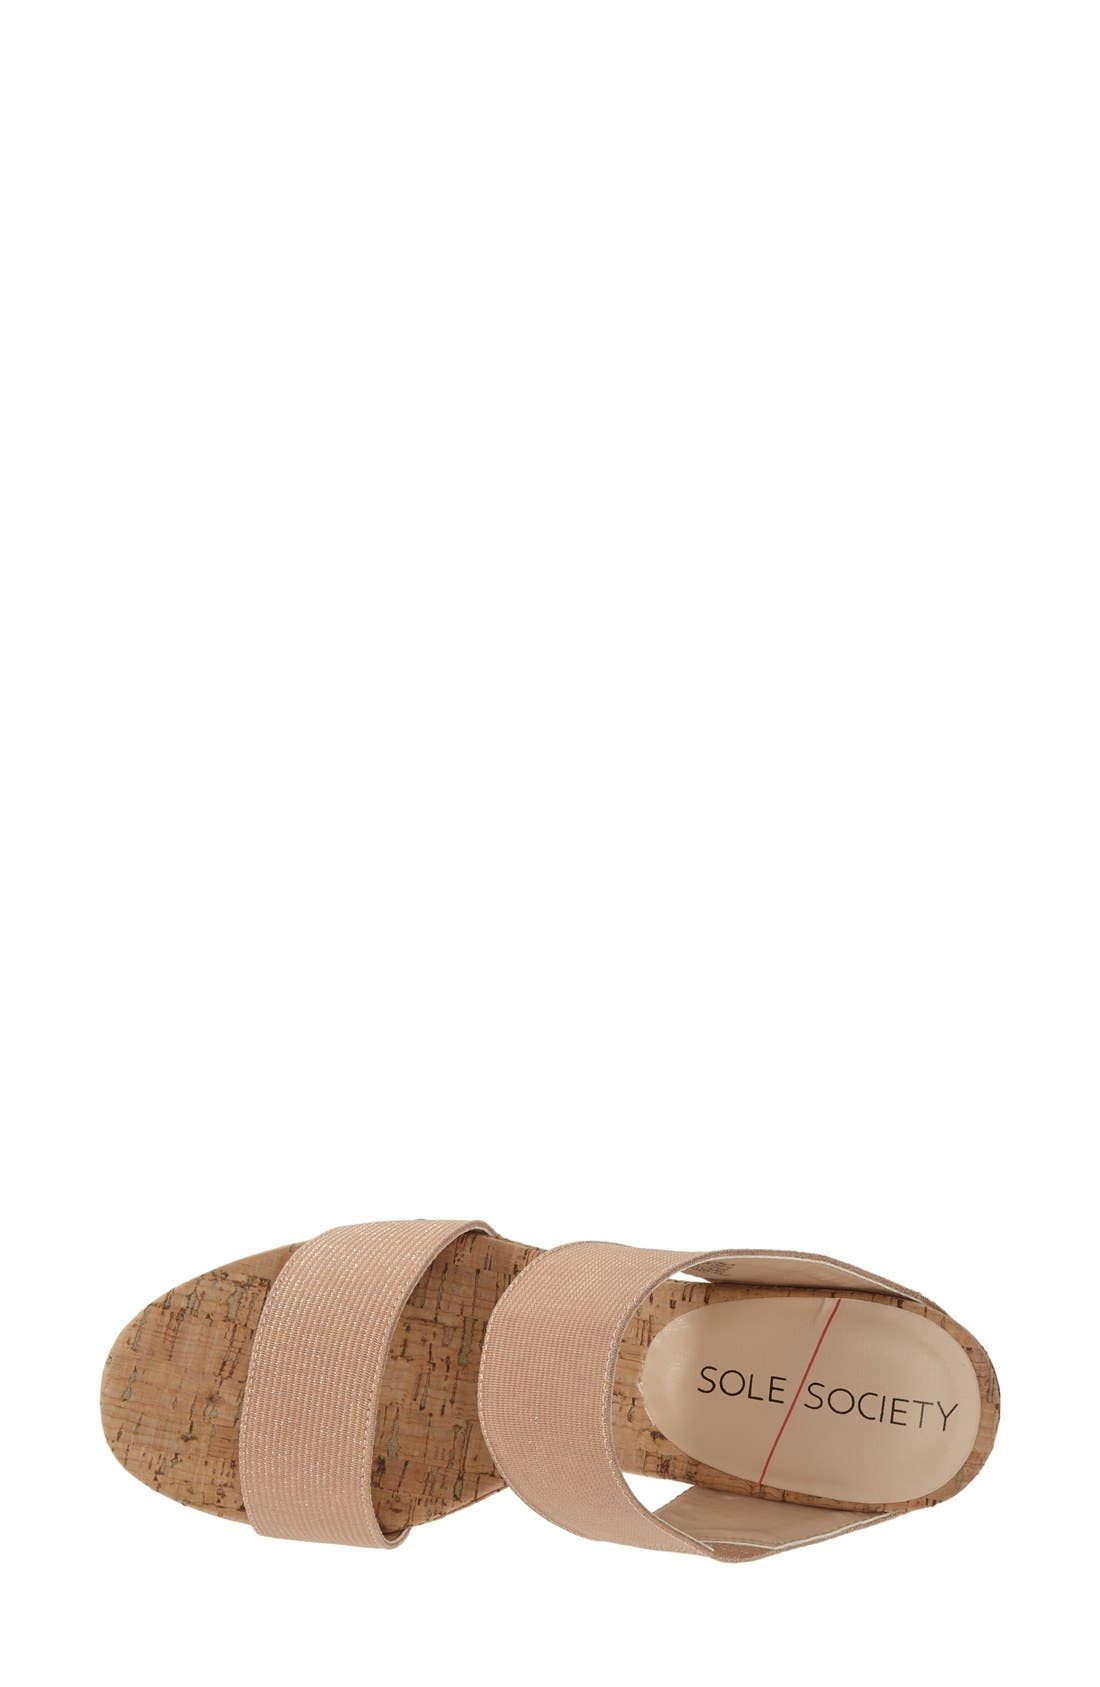 'Emilia 2' Wedge Sandal,                             Alternate thumbnail 4, color,                             Blush Champagne